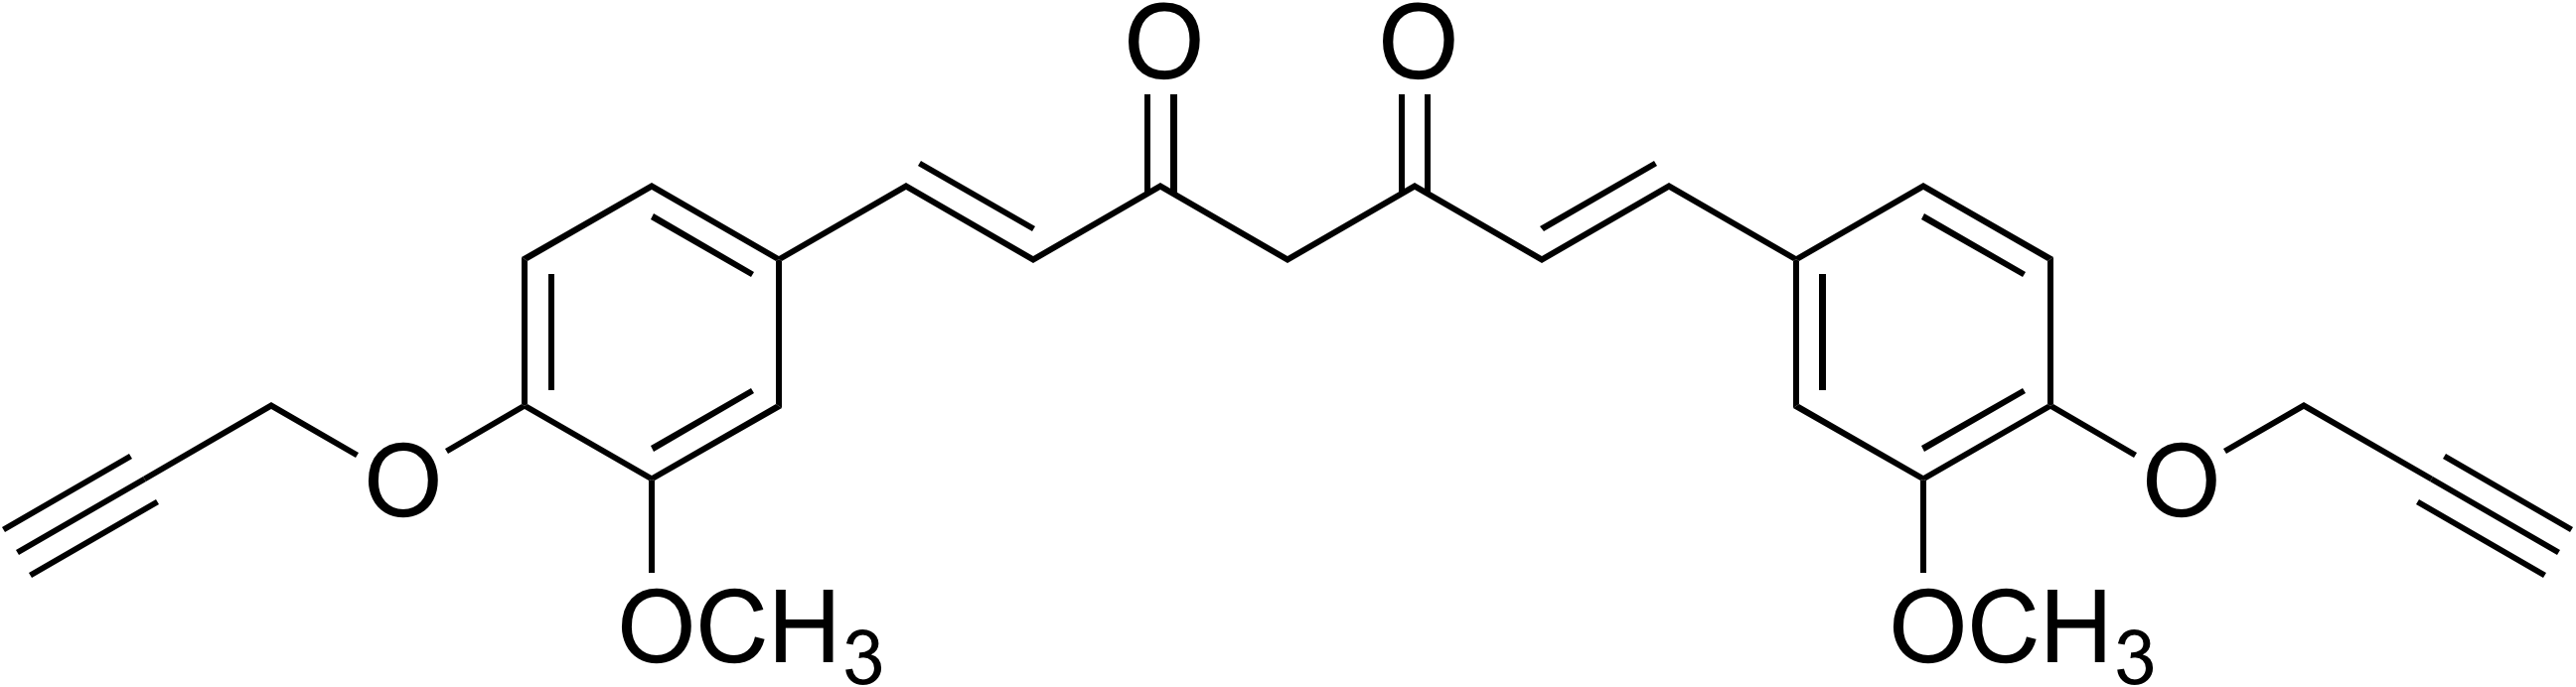 Curcumin-dialkyne